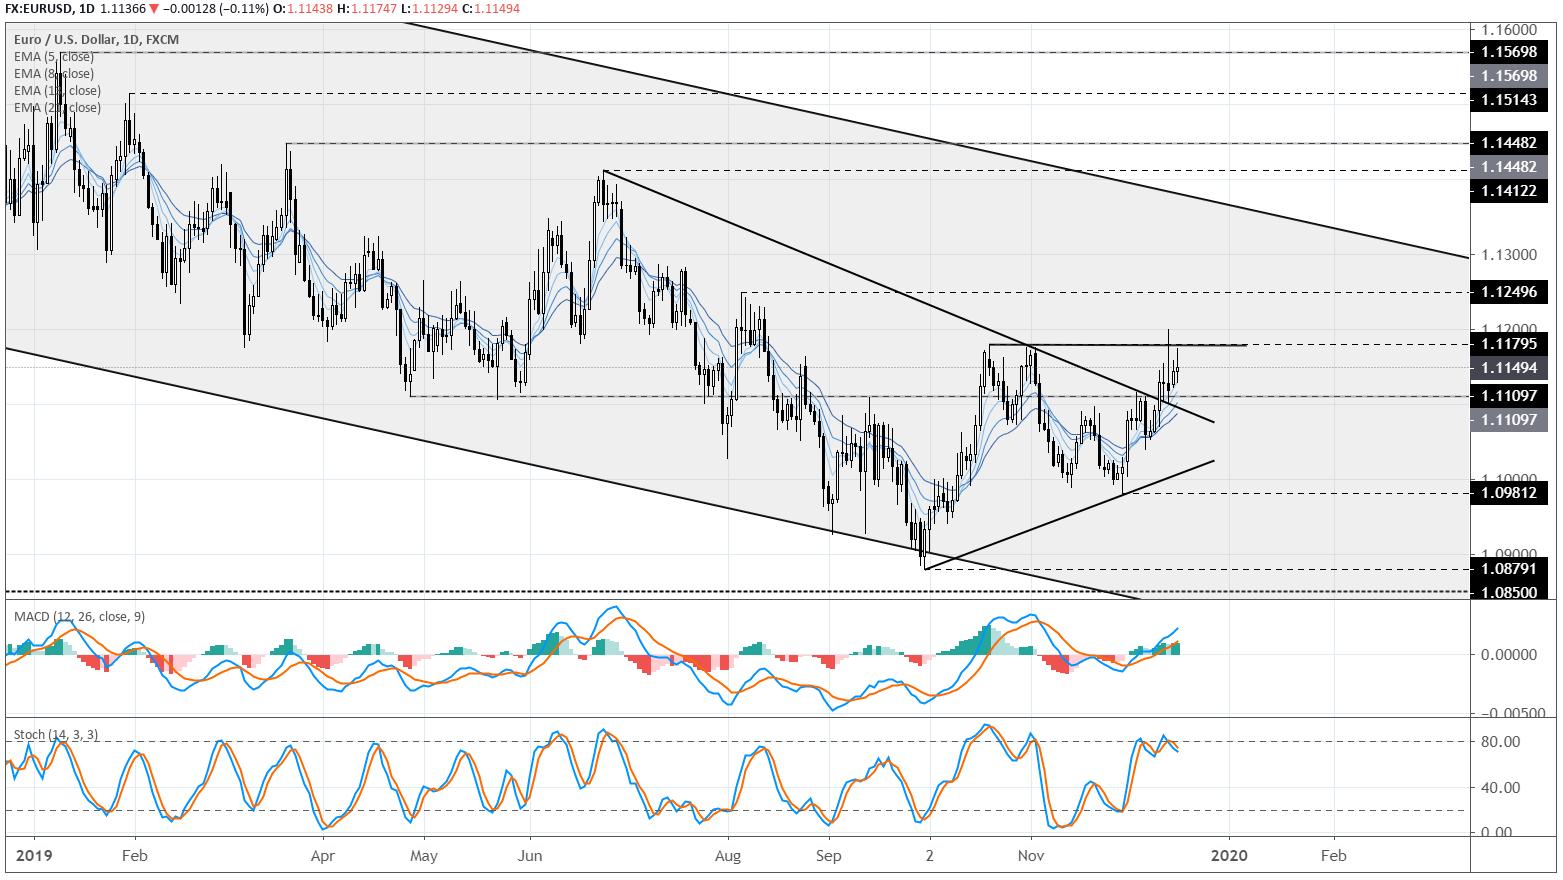 Euro Rate Technical Forecast: Q1 2020 regarding Rut Forecast 2020